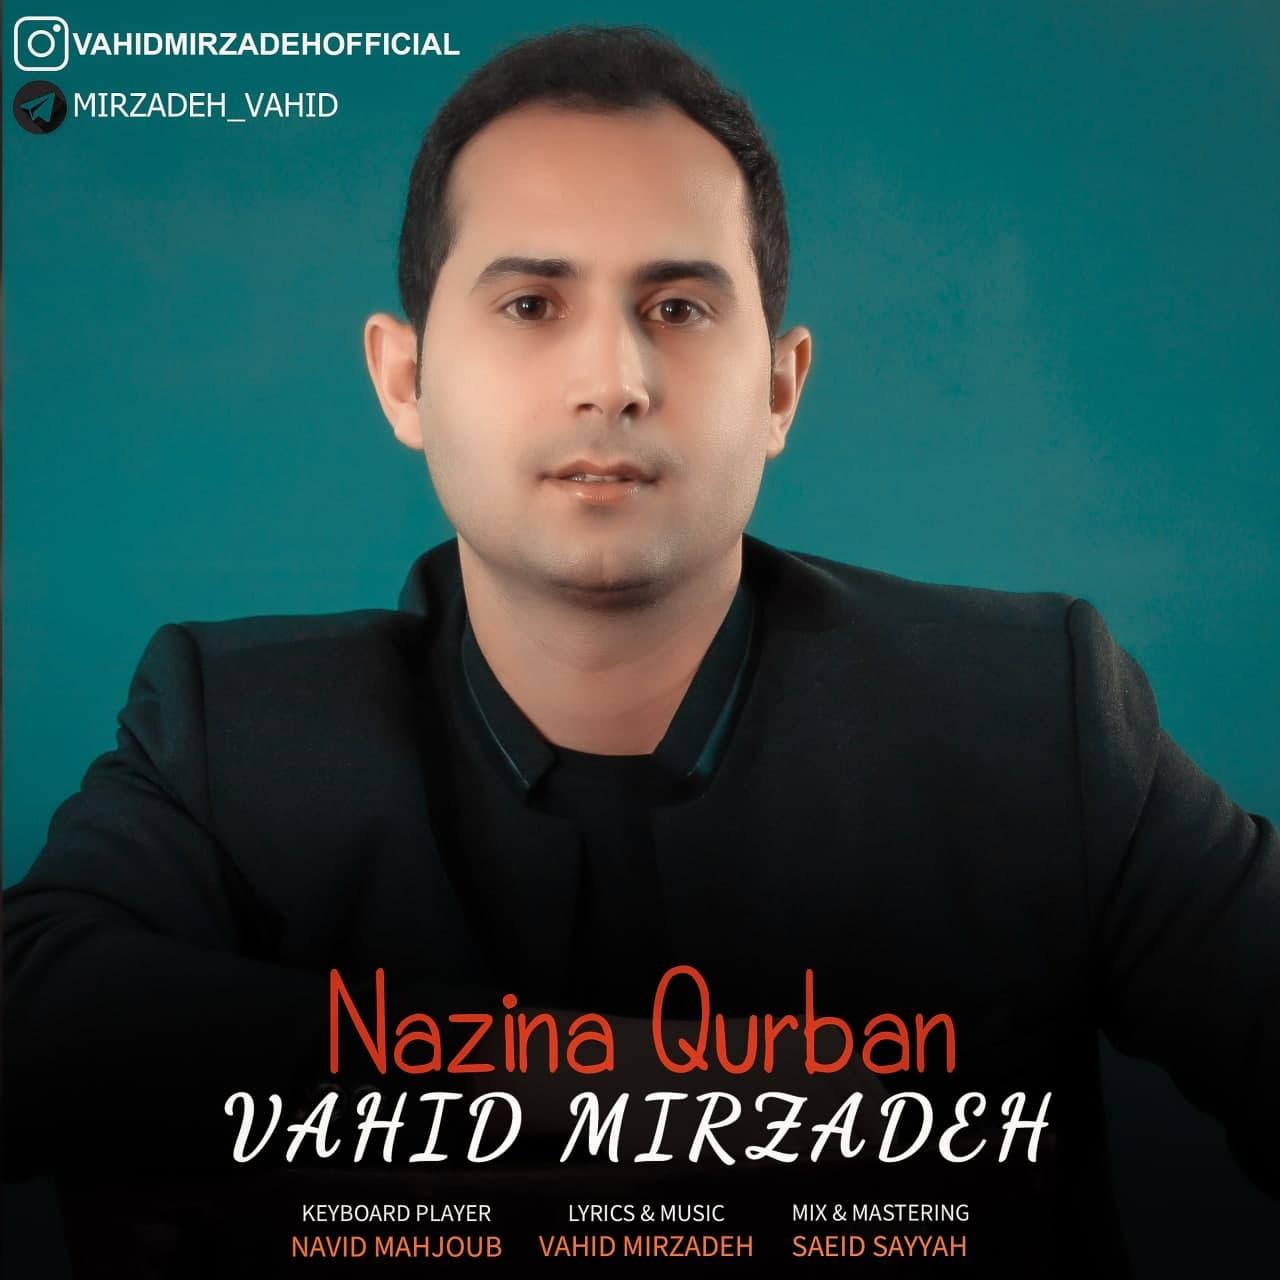 https://s19.picofile.com/file/8433600926/18Vahid_Mirzadeh_Nazina_Qurban.jpg